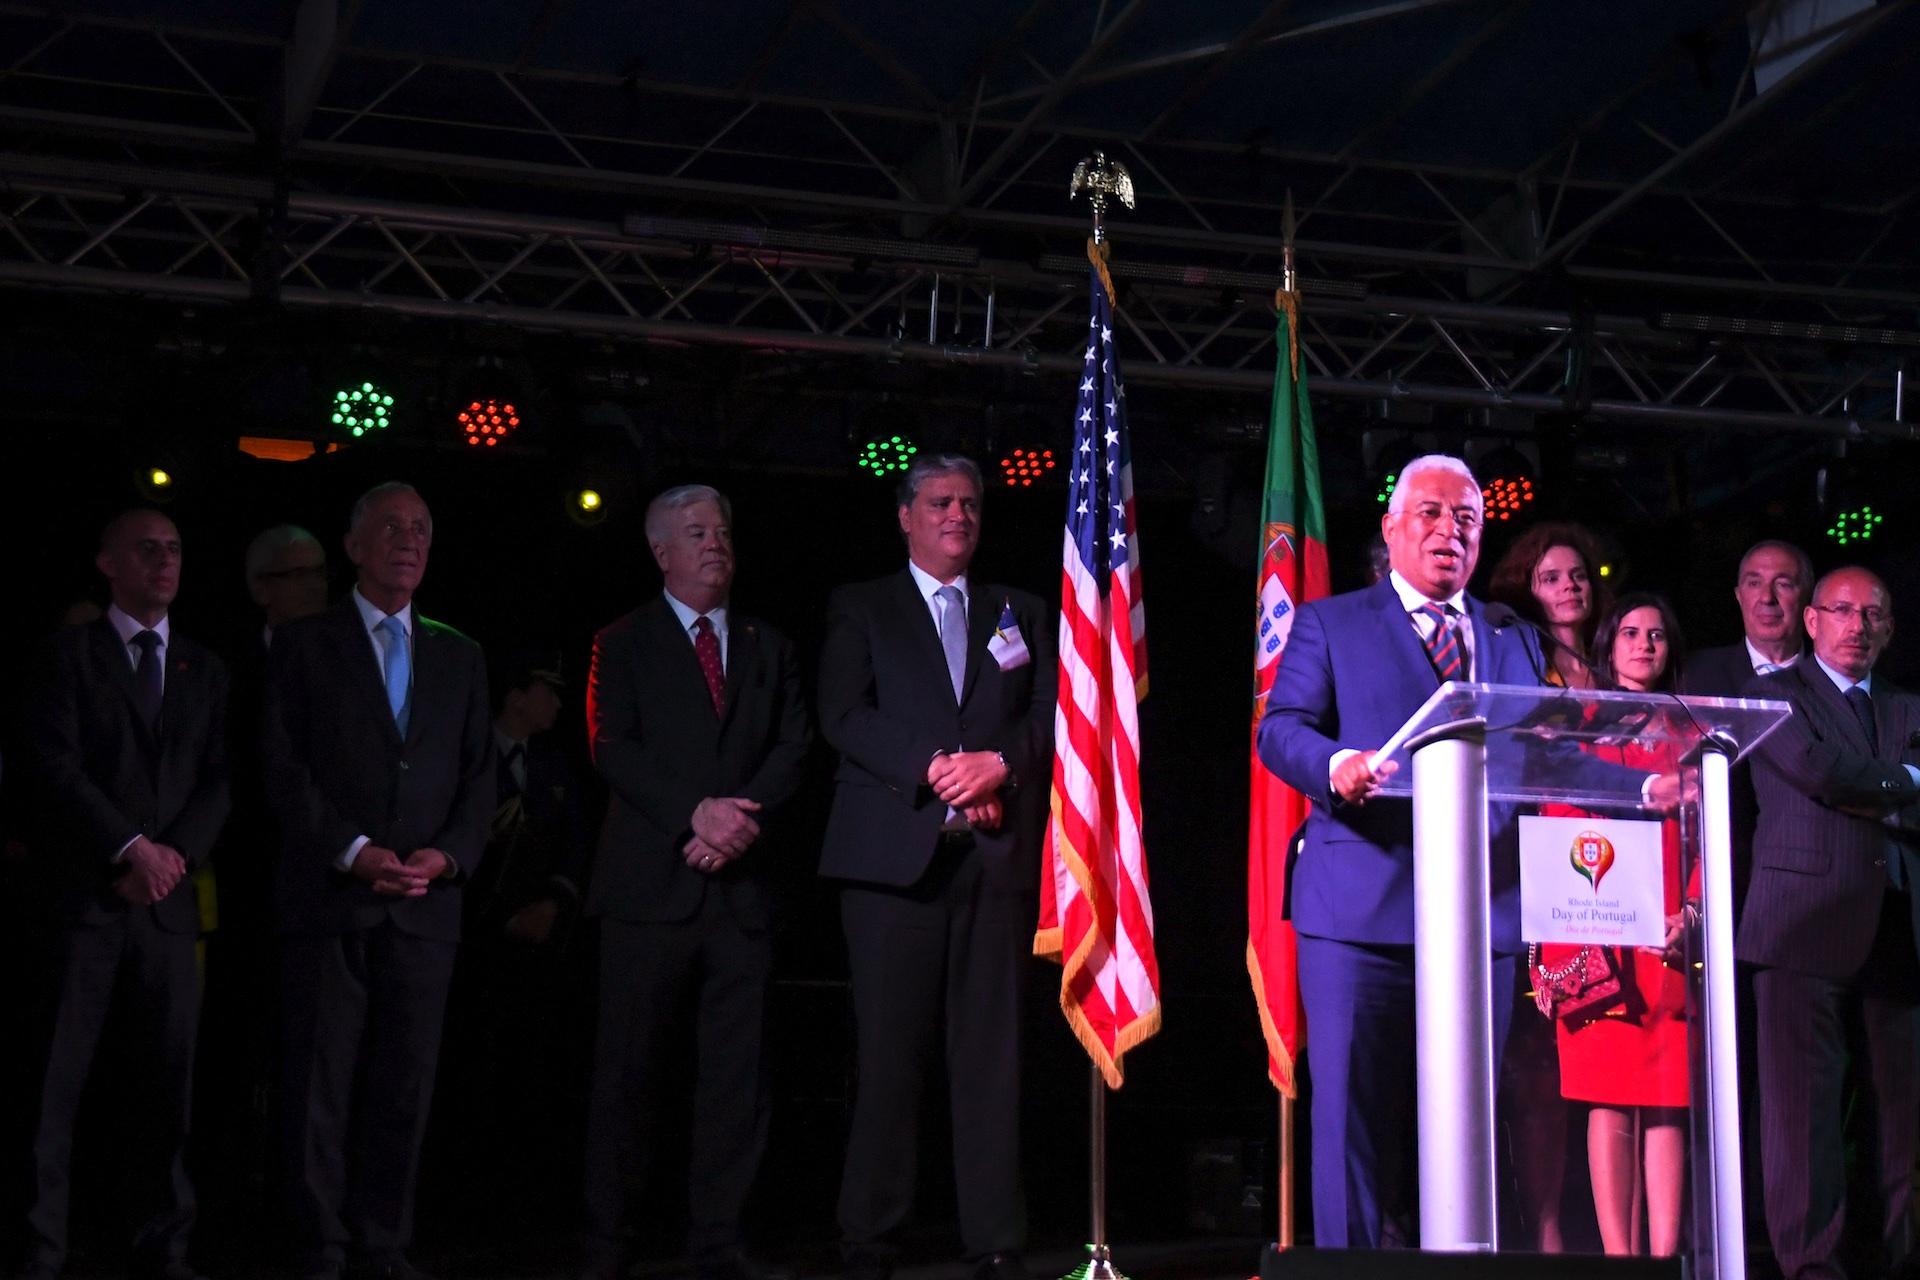 prime-minister-antonio-costa-addresses-the-crowd-in-the-alex-and-ani-city-center_41893860005_o